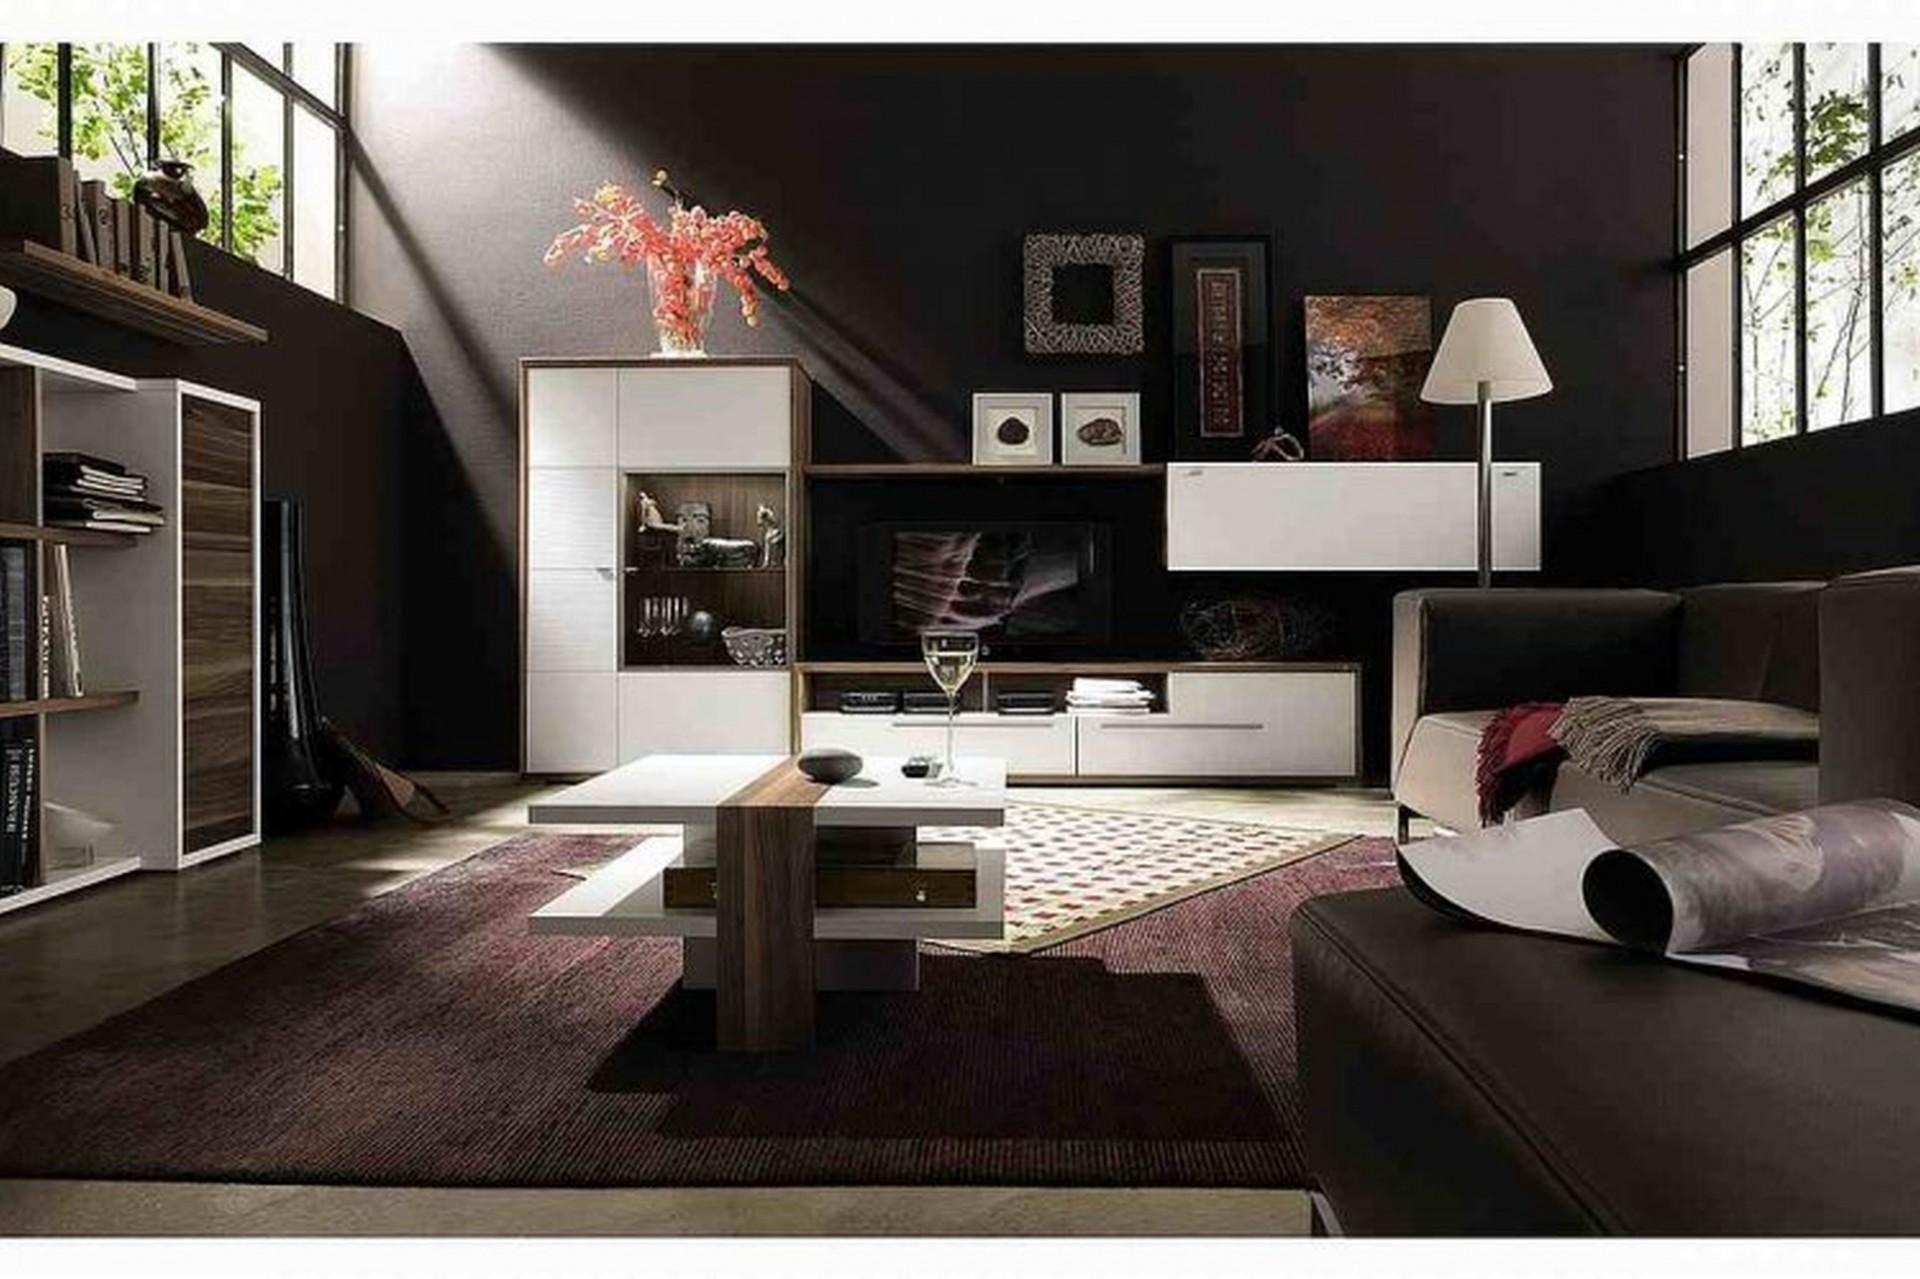 комната в коричневом стиле  № 1730696 без смс